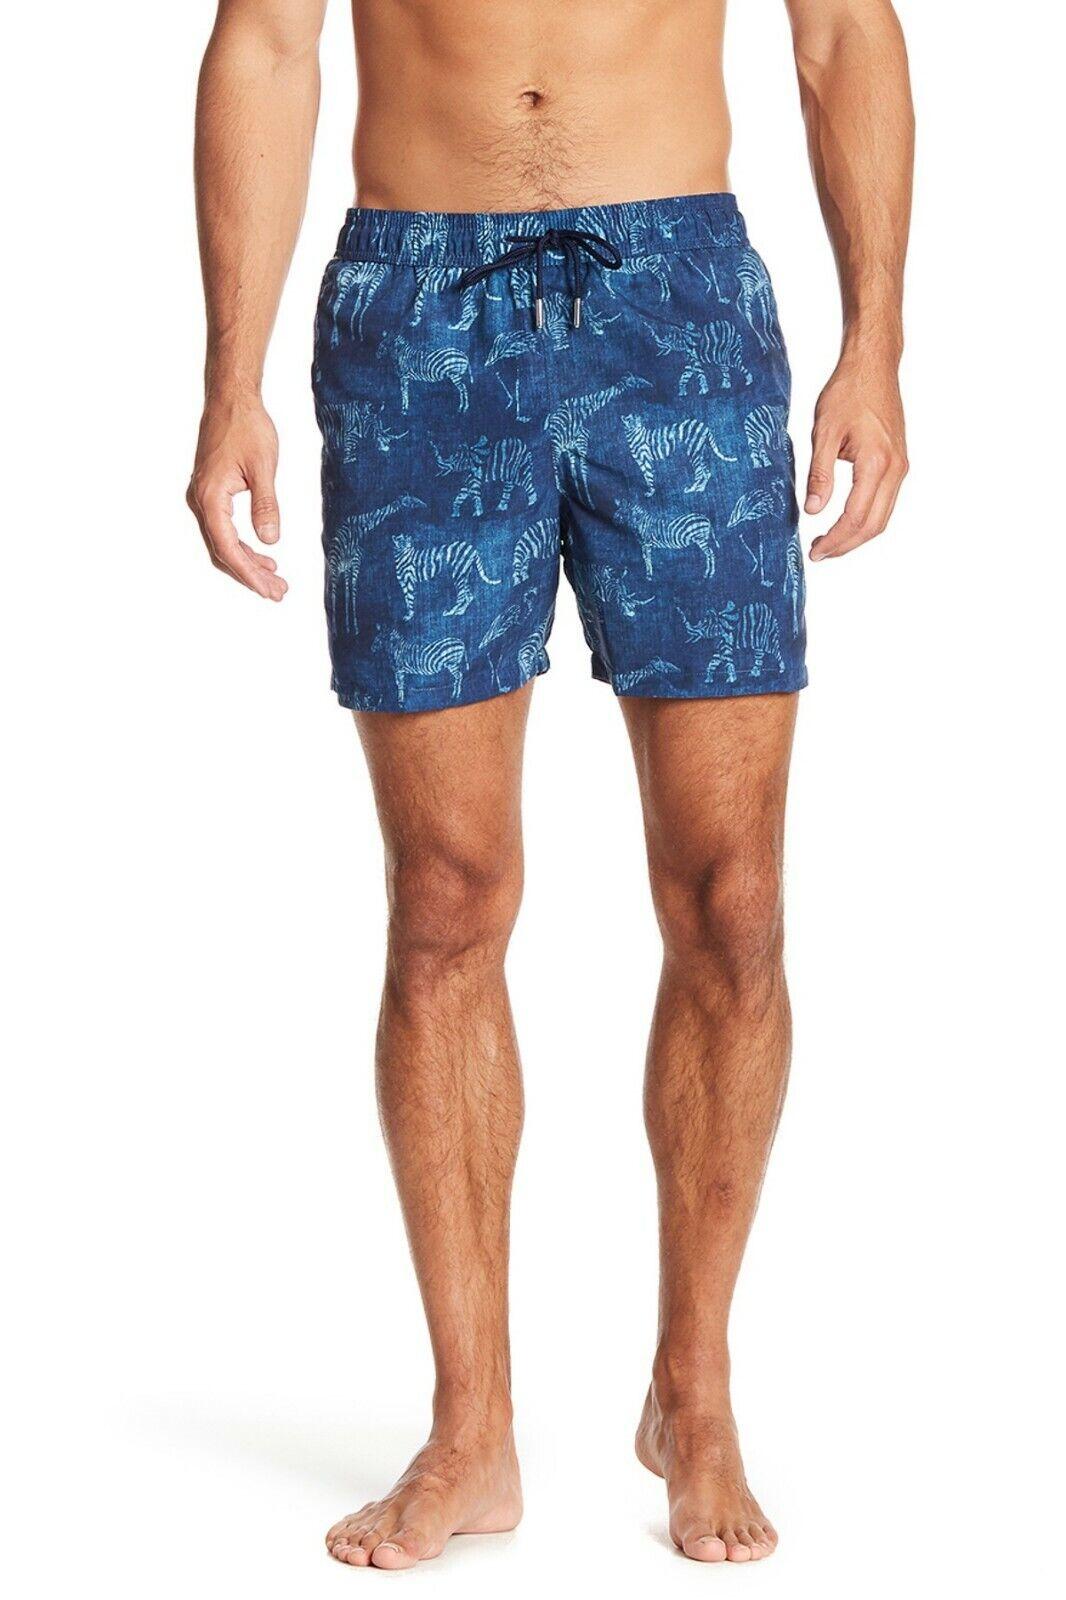 174b08ead9739 Jared Lang Men's Navy bluee Elephant Swim Trunks Print Animal ...